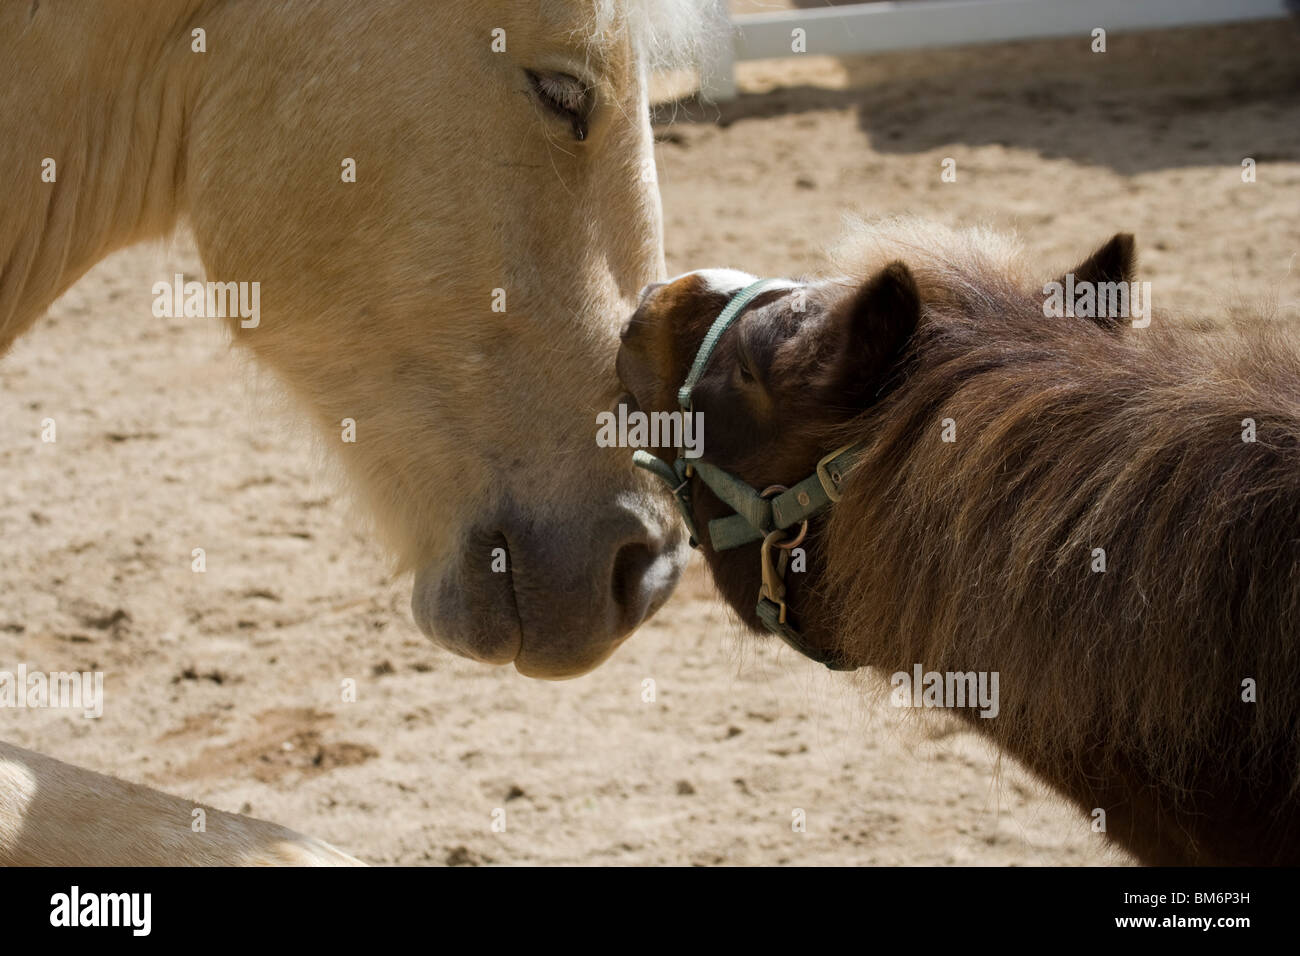 Shetland Pony and American Cream Draft Horse at  Cosley Zoo - Stock Image